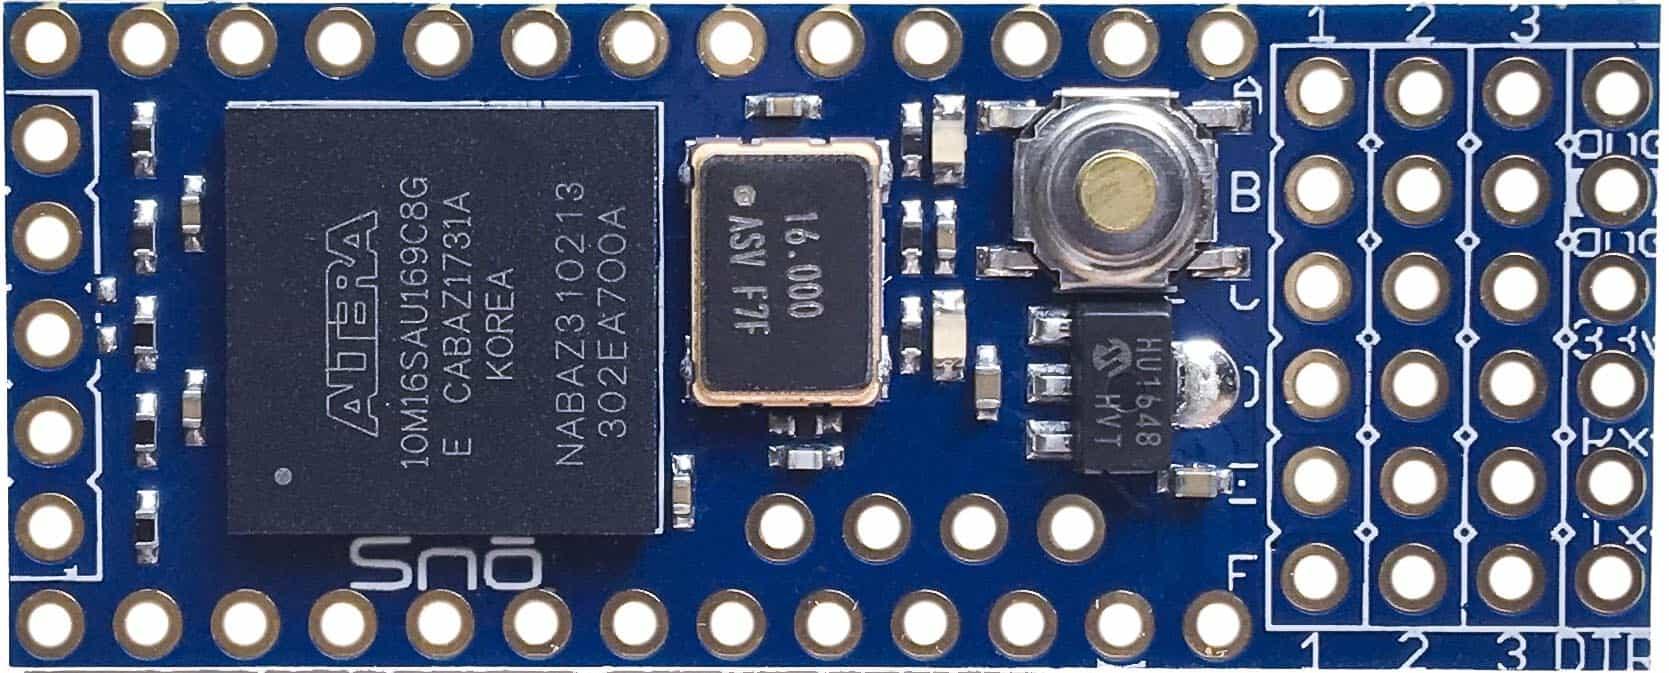 Snō FPGA Images